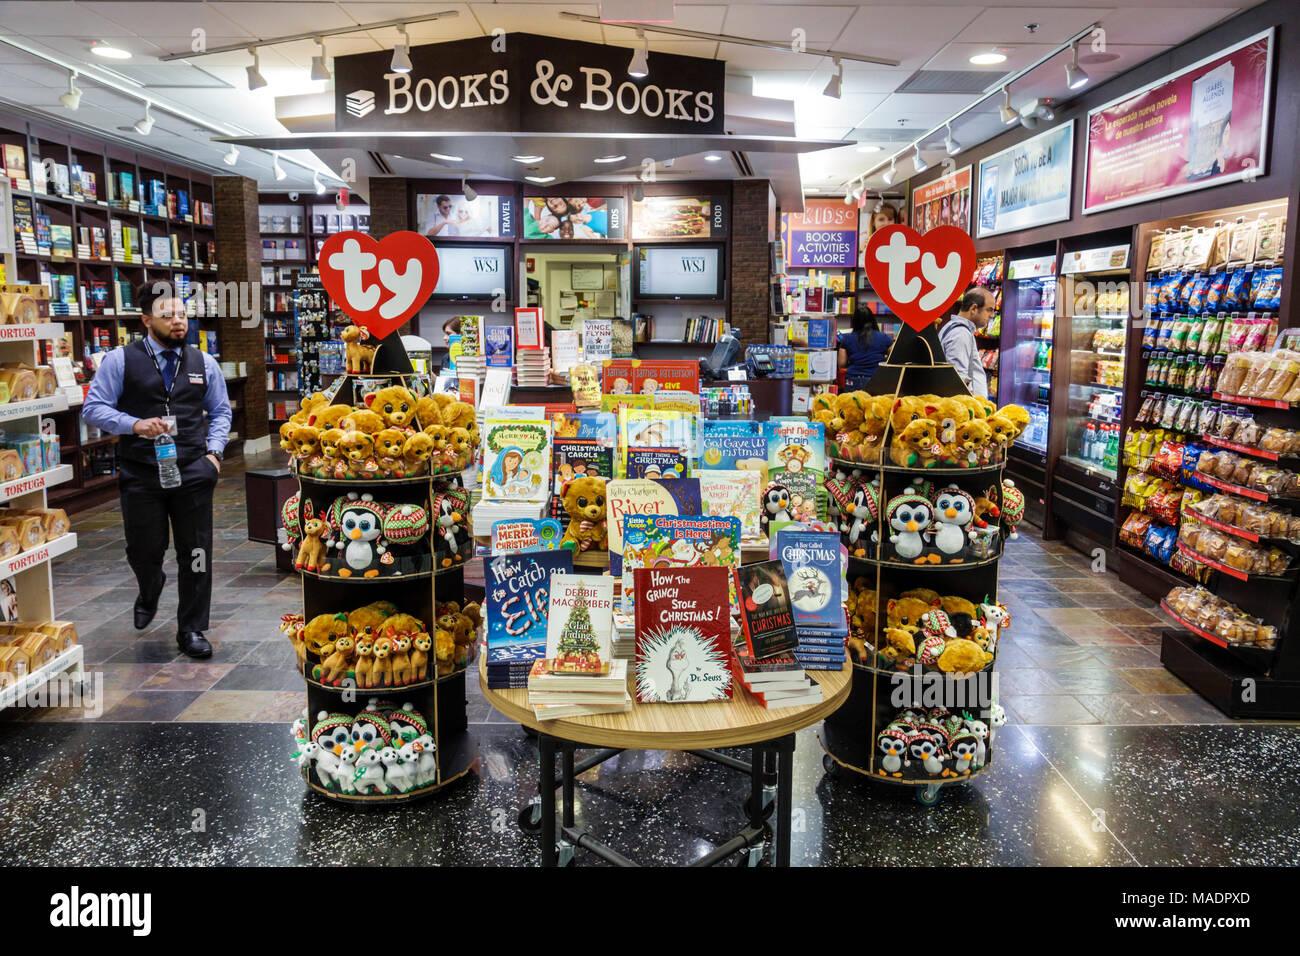 cd342ec43be Miami Florida Miami International Airport MIA terminal concourse gate area  interior shopping Books   Books bookstore